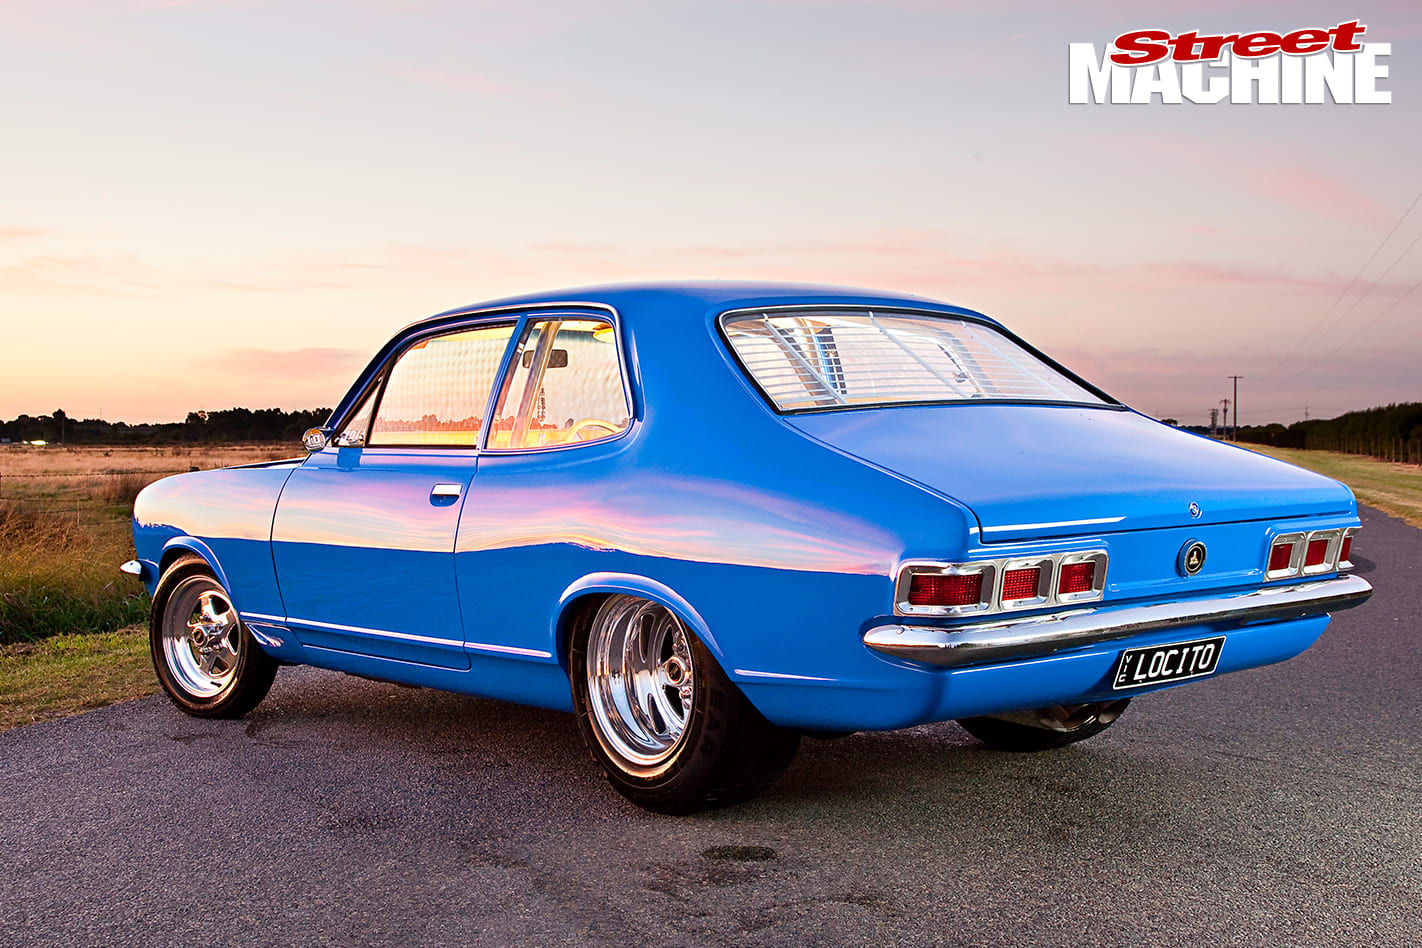 Holden -LJ-Torana -Coupe -side -rear